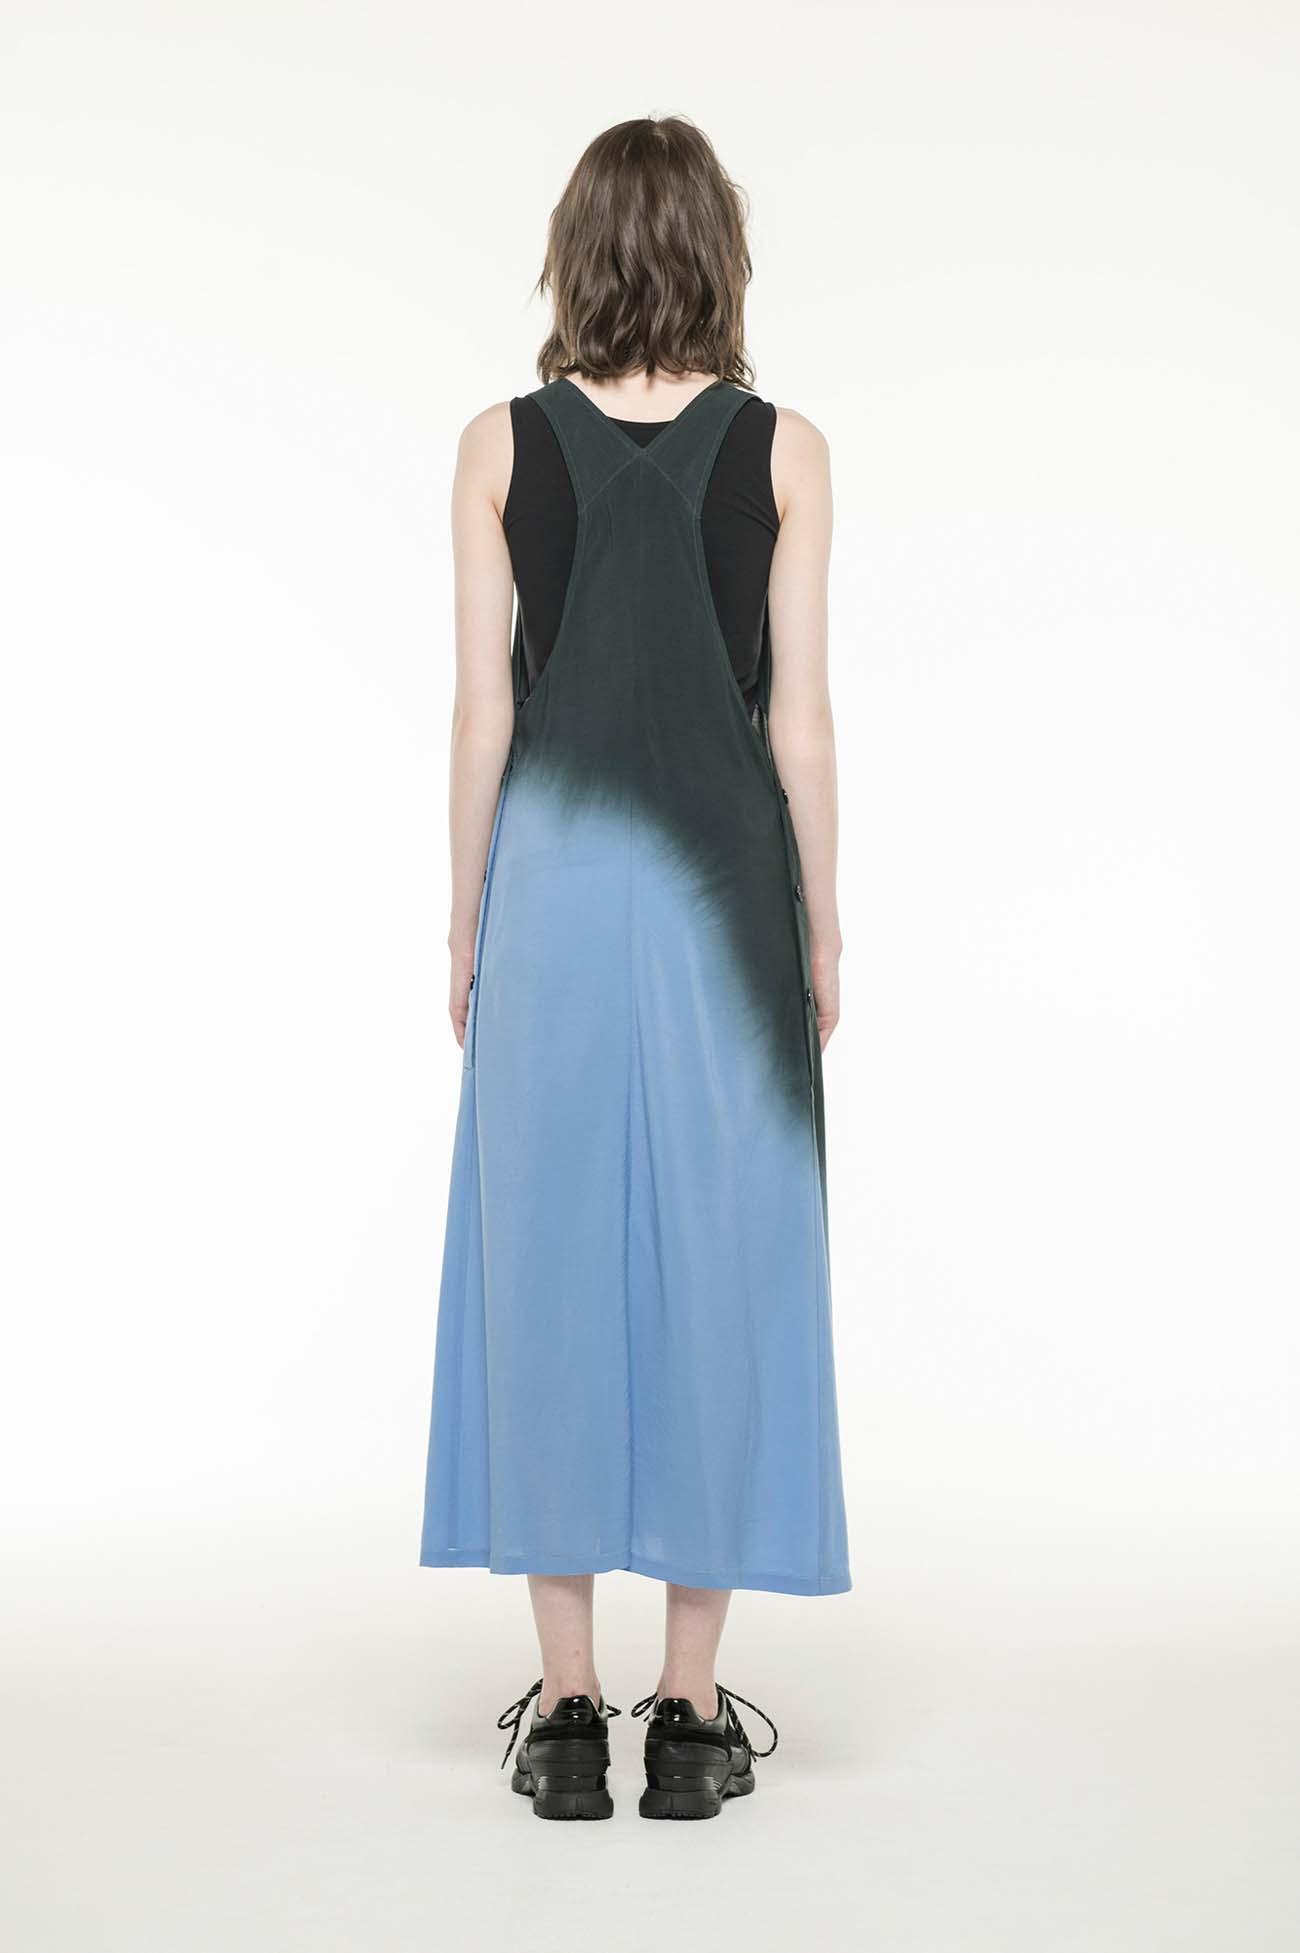 Cu/ MODAL BOYLE GD DYE JUMPSUIT DRESS